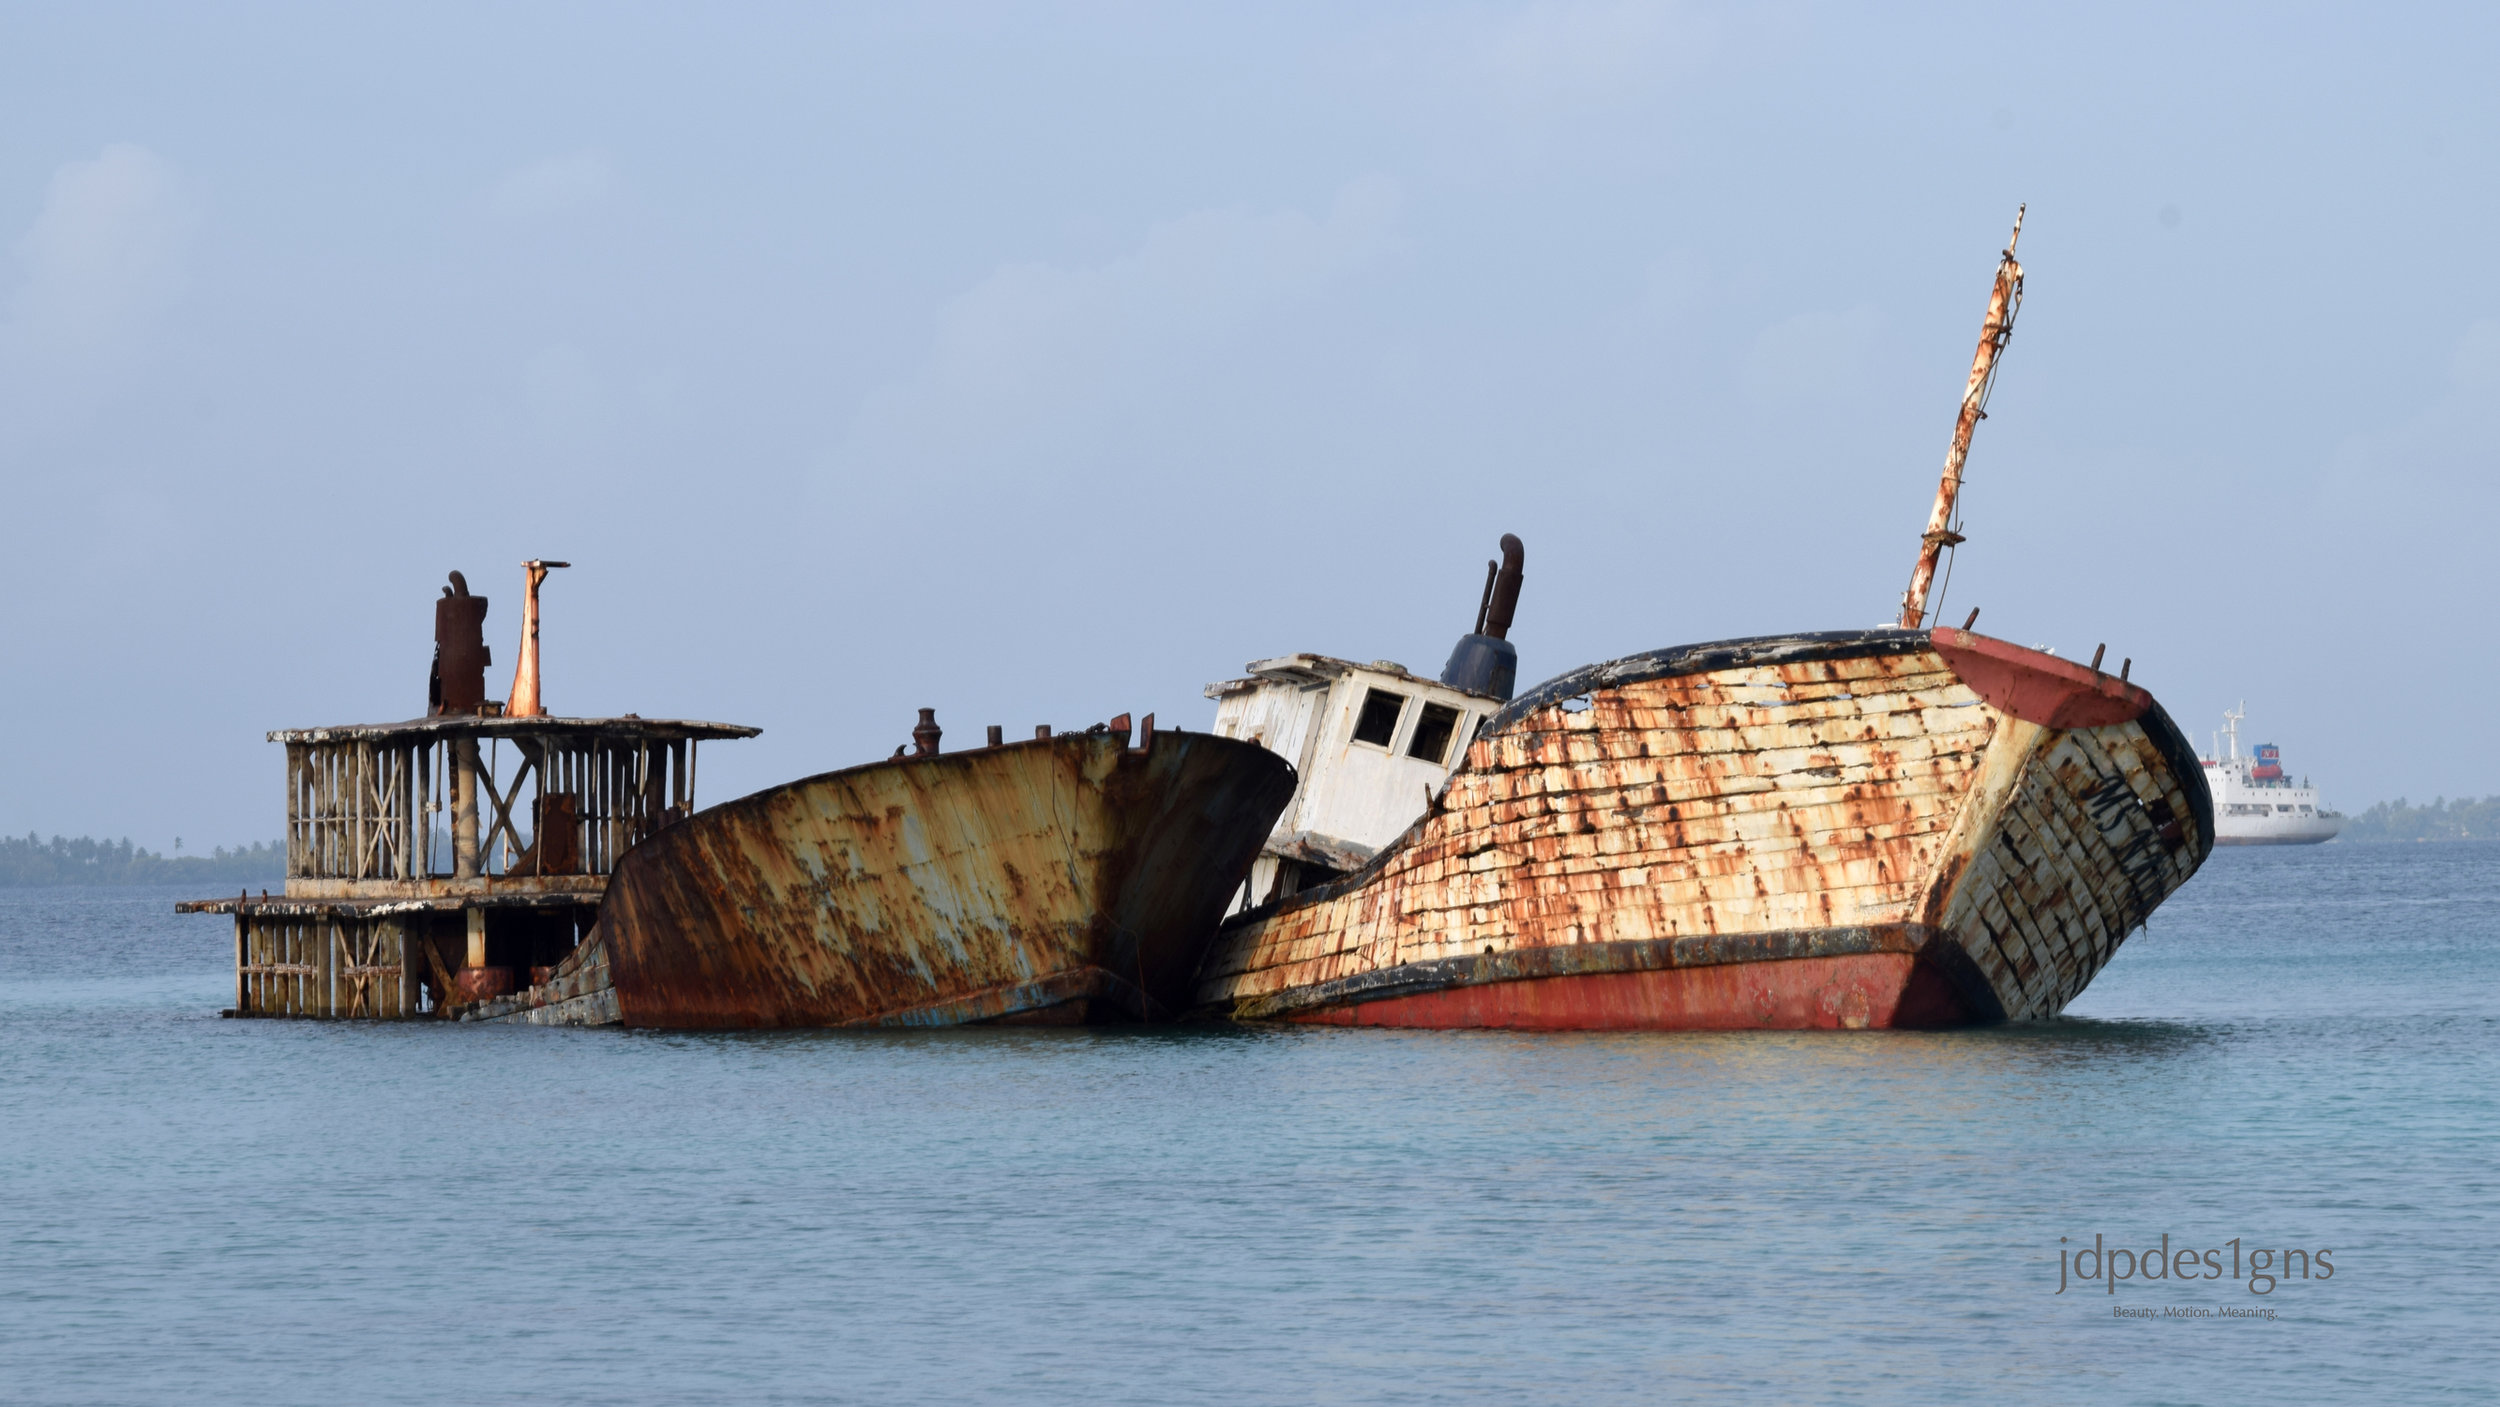 Rusting Boats in Lagoon Resize.jpg